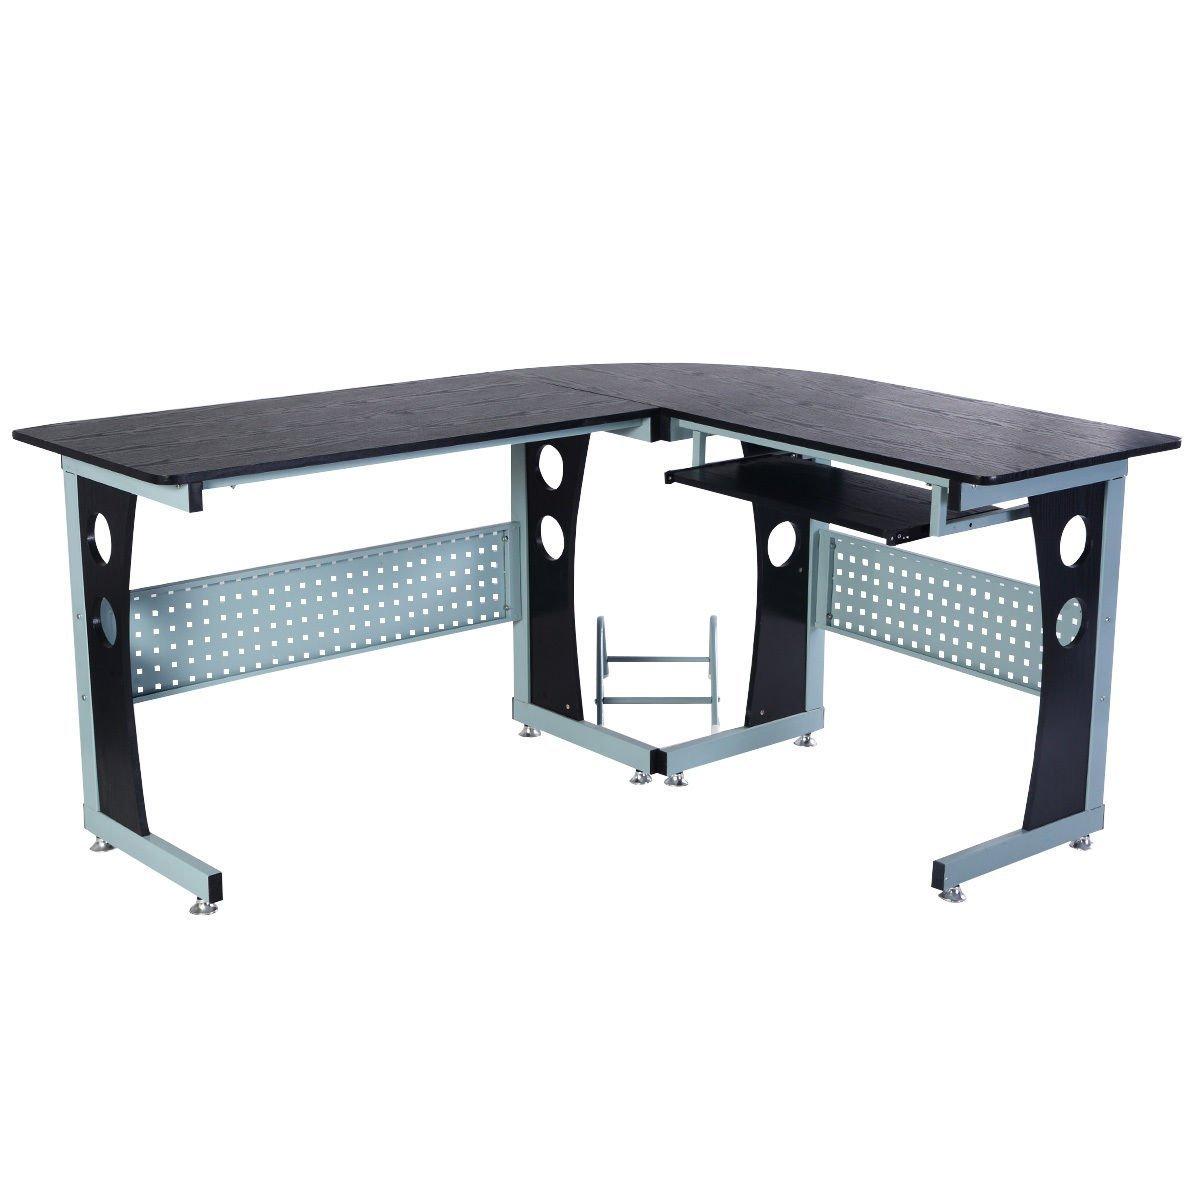 Tangkula Corner Computer Desk PC Table Workstation Home Office Wood L-Shape Black